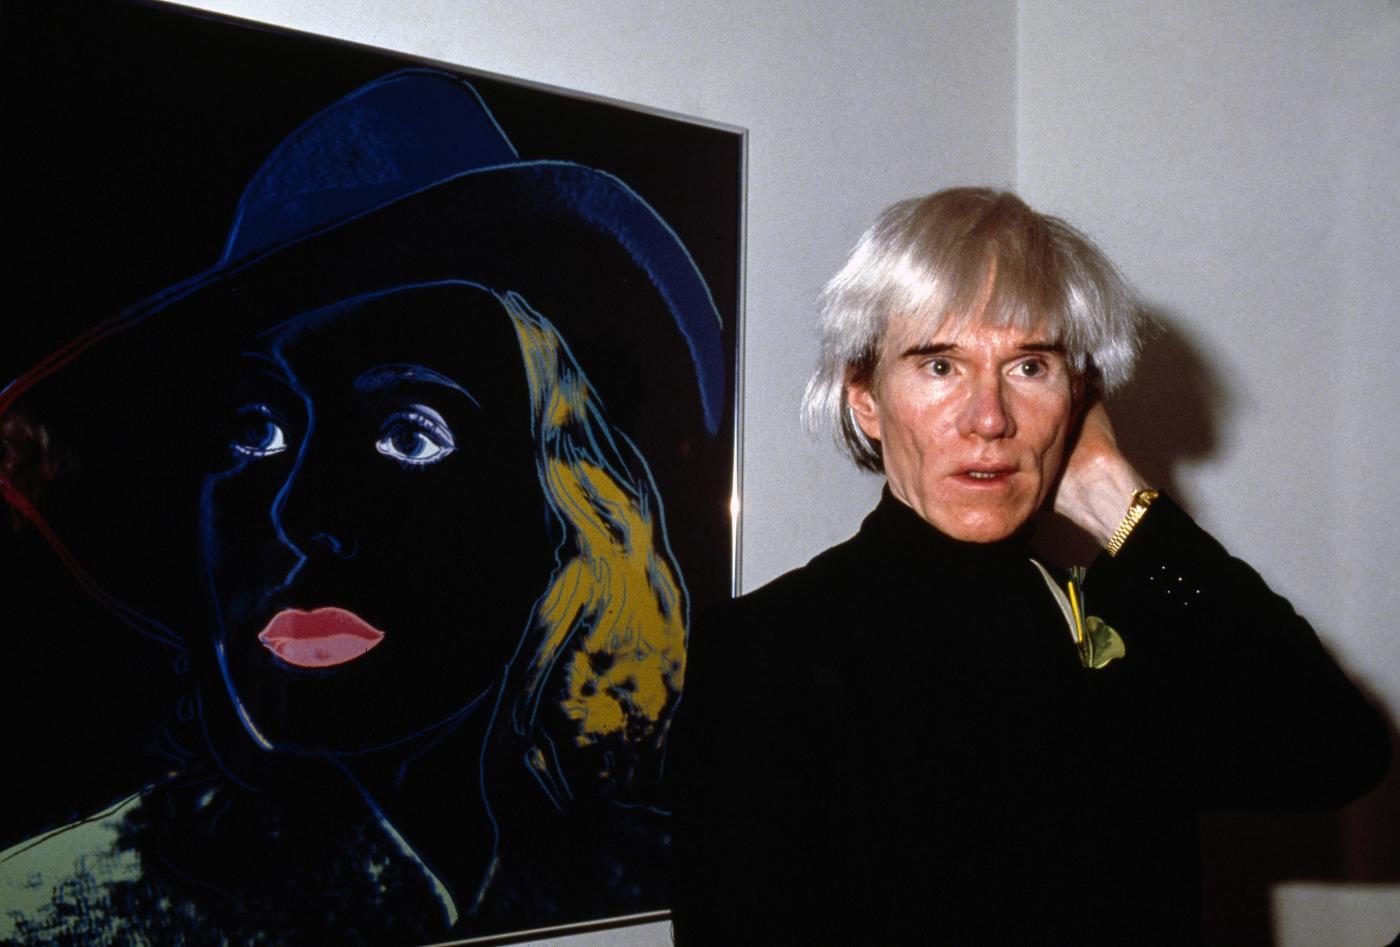 Mostra Warhol Genova: a Palazzo Ducale dal 21 ottobre al 26 febbraio 2017